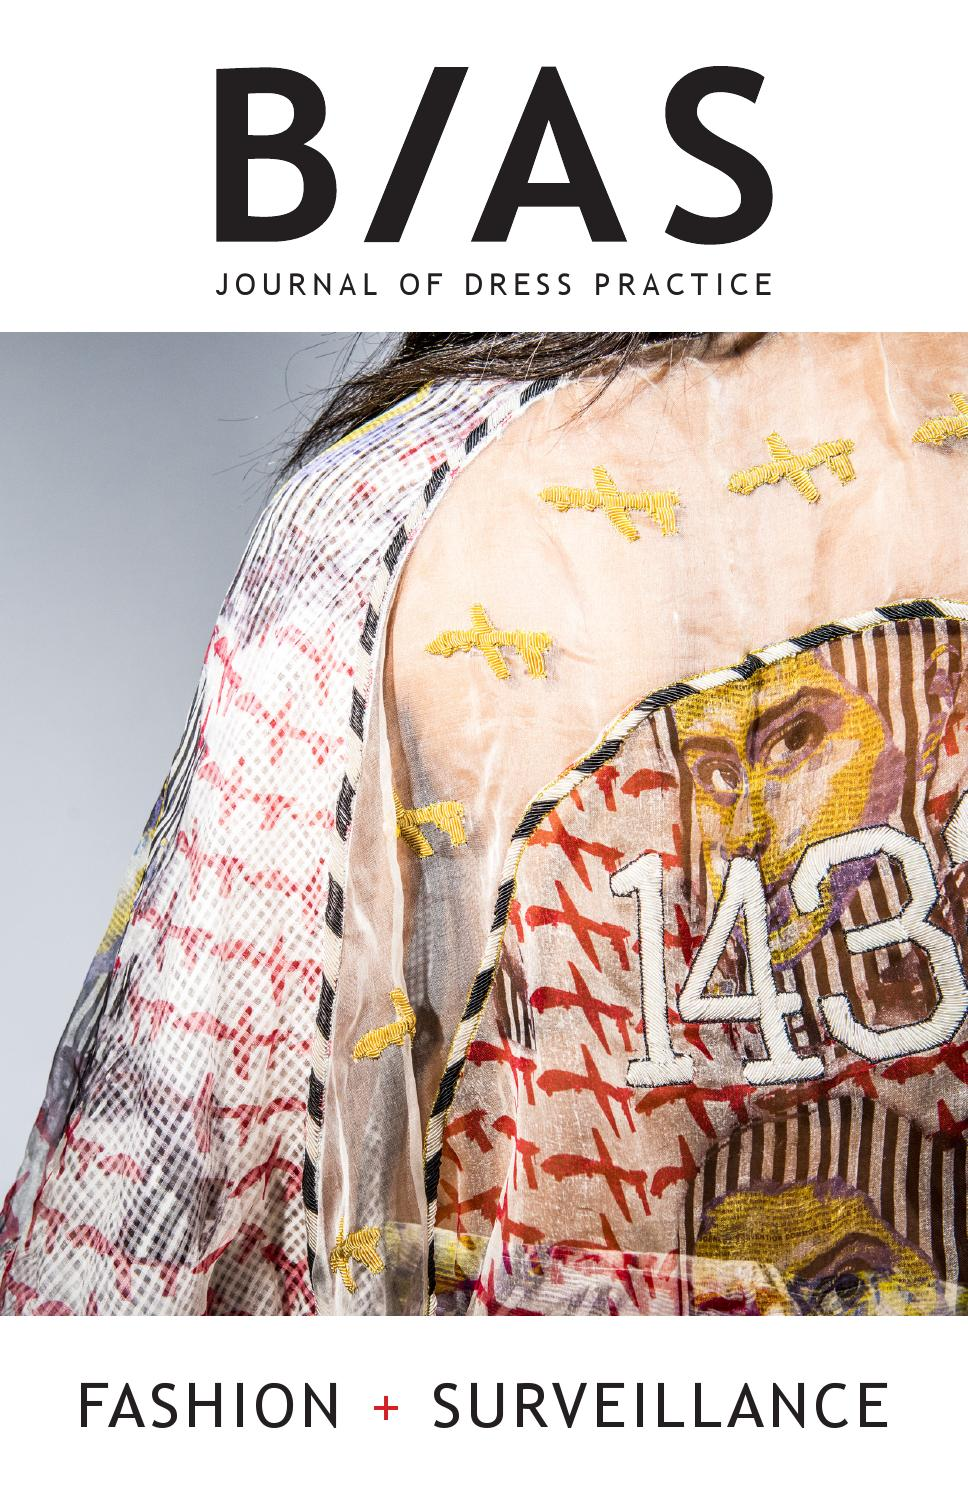 BIAS Journal of Dress Practice Issue 3: Fashion + Surveillance by  dresspracticecollective - issuu